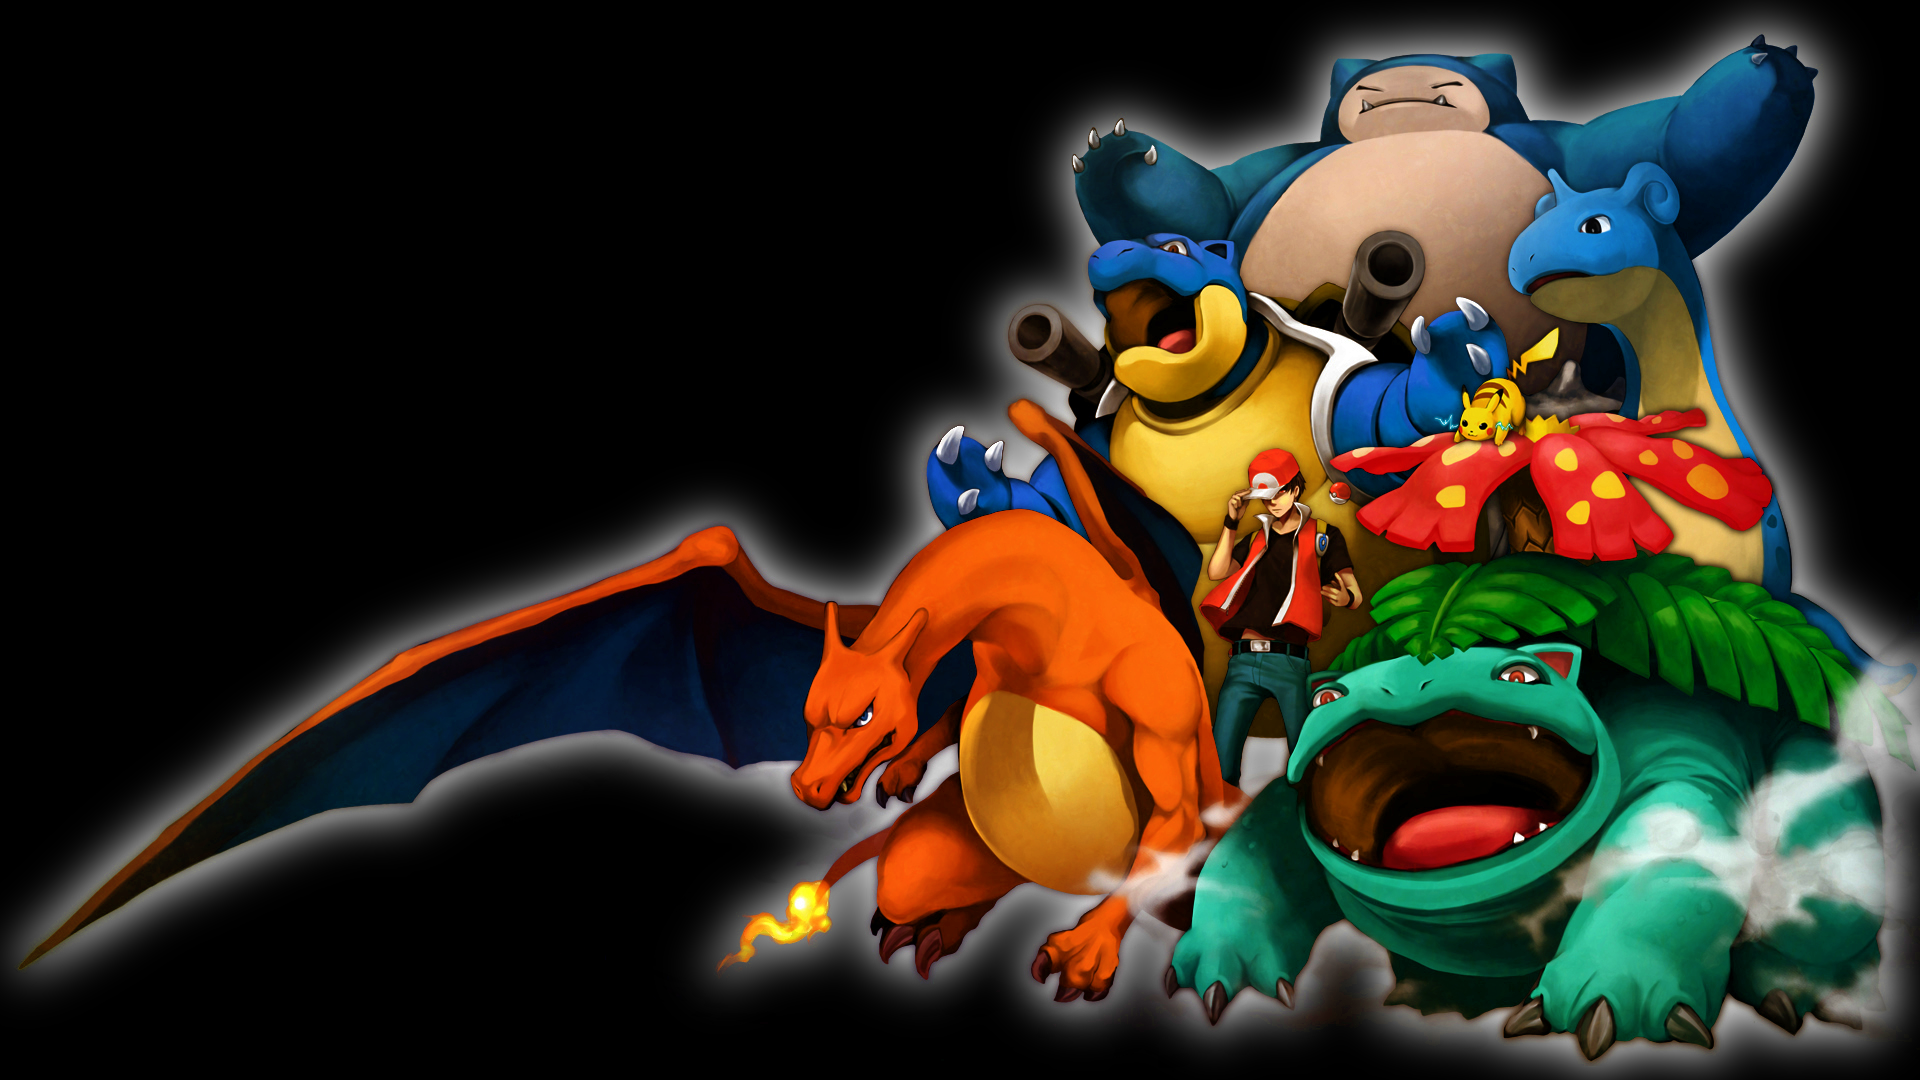 [46+] Awesome HD Pokemon Wallpapers on WallpaperSafari